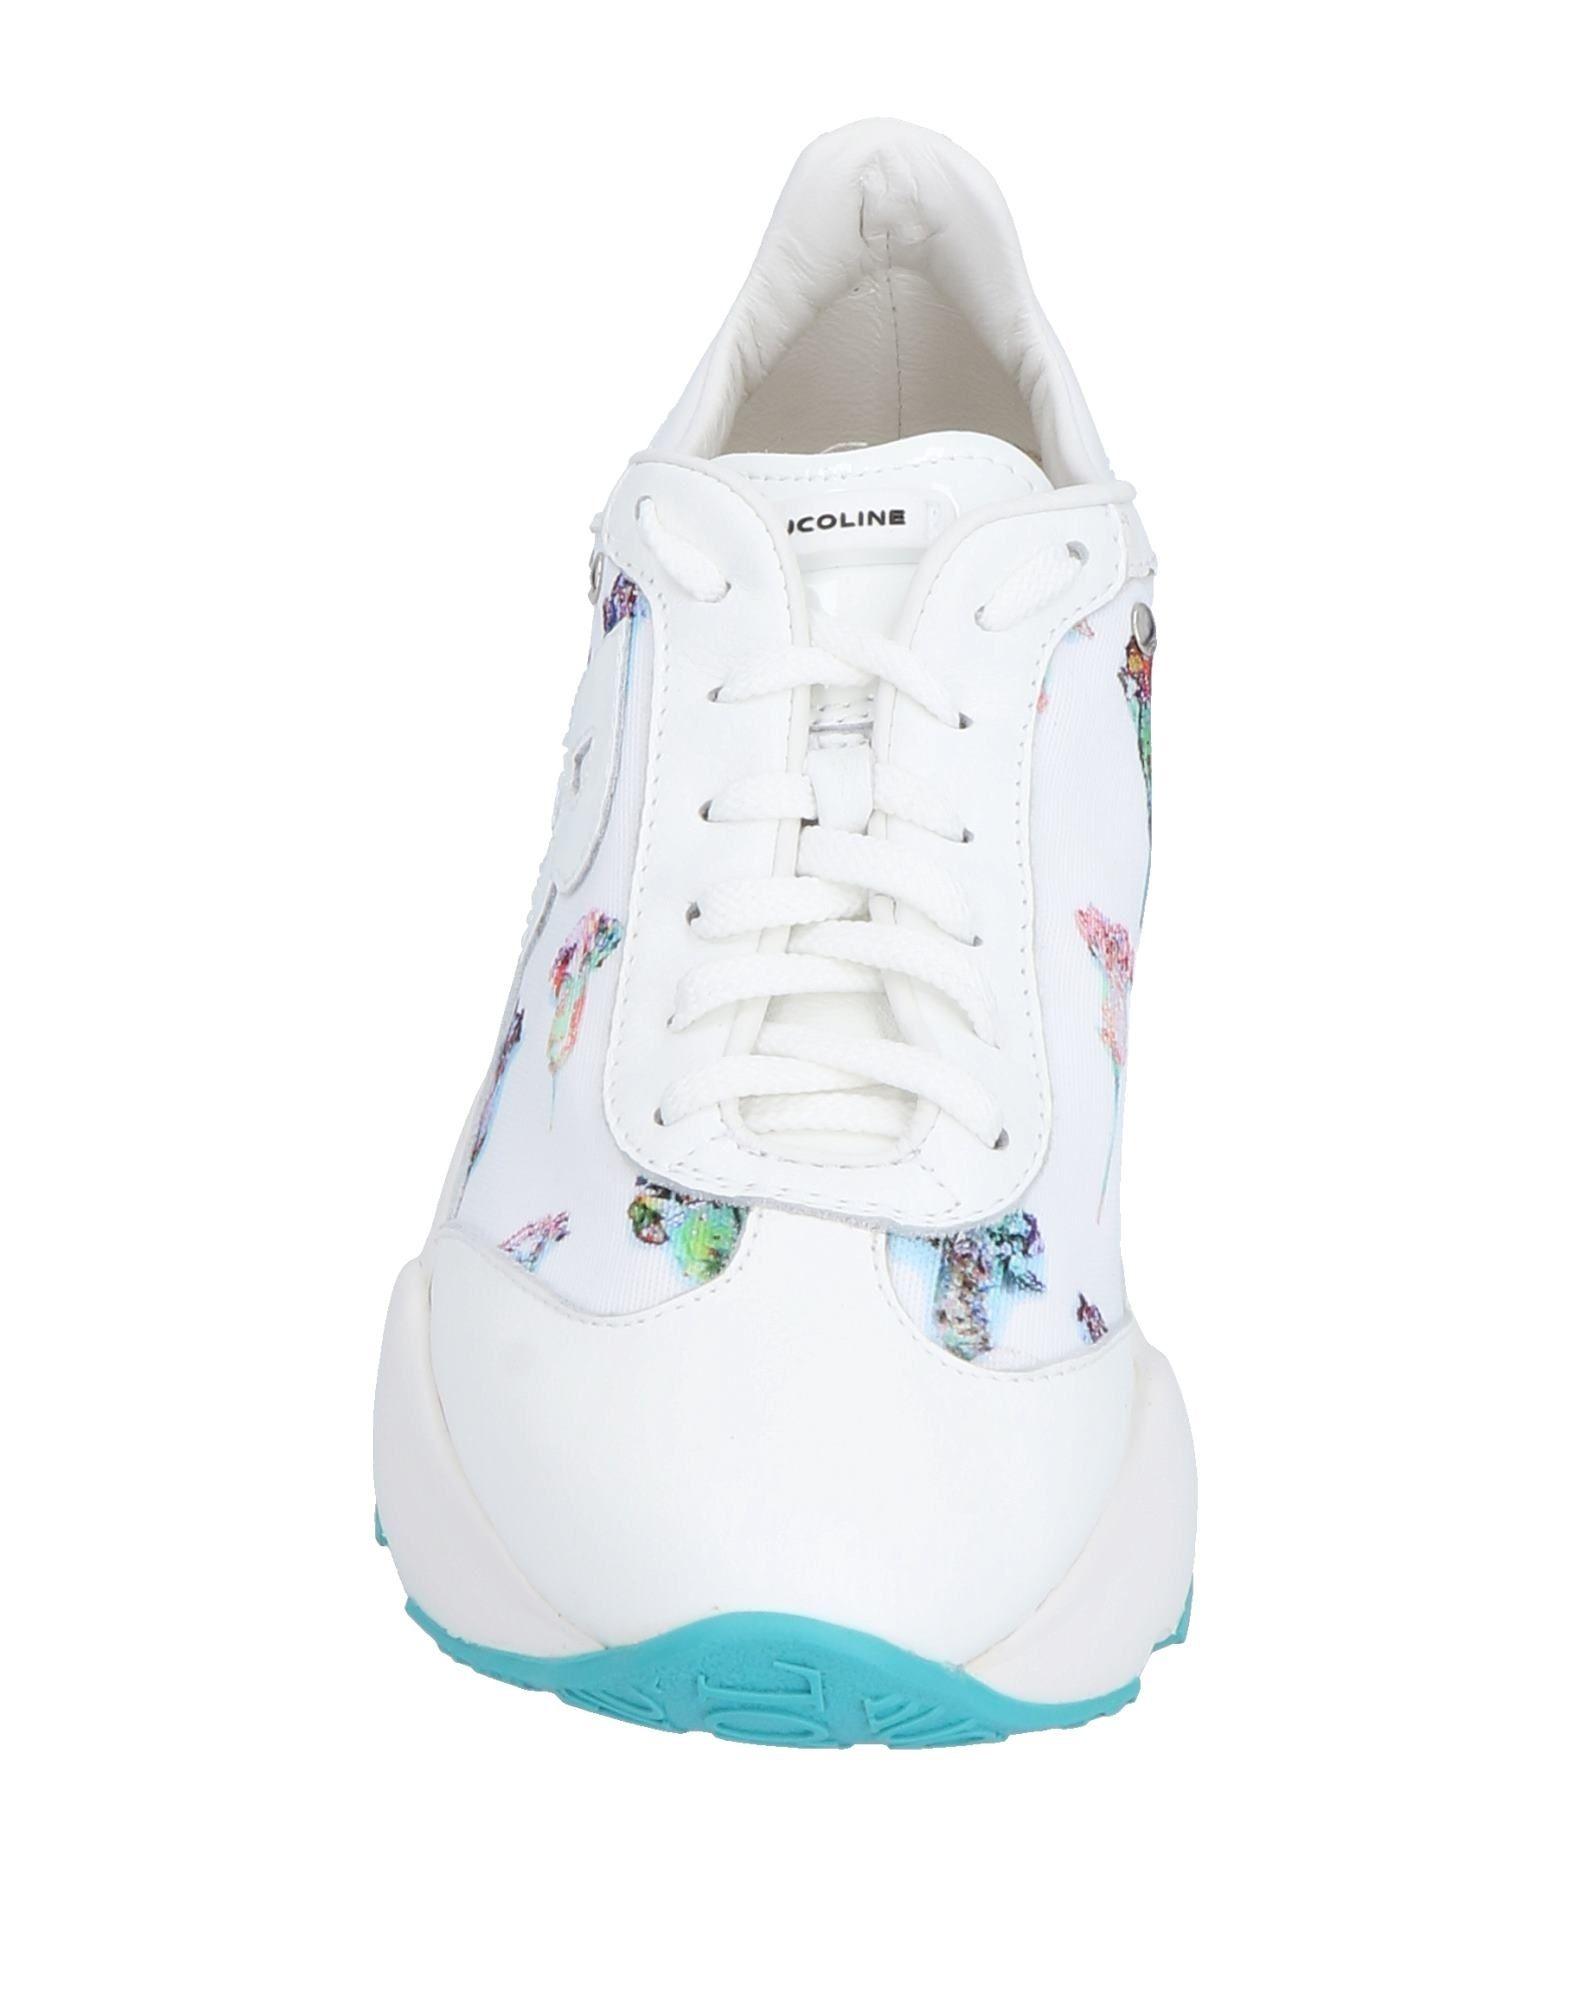 Stilvolle Sneakers billige Schuhe Ruco Line Sneakers Stilvolle Damen  11492295BO 0cd151